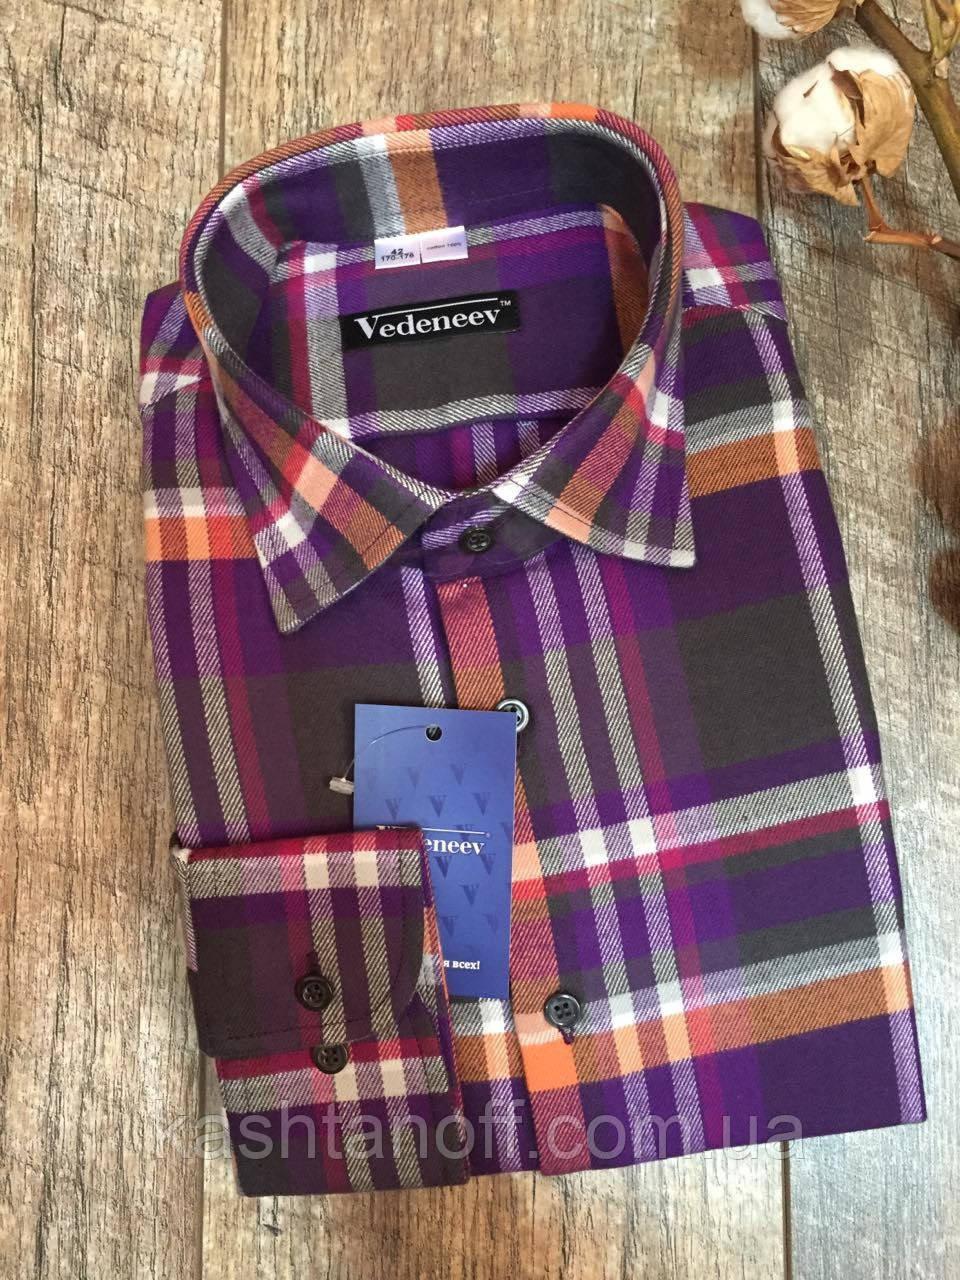 26e82a7876b Фланелевая рубашка в фиолетово-серую клетку